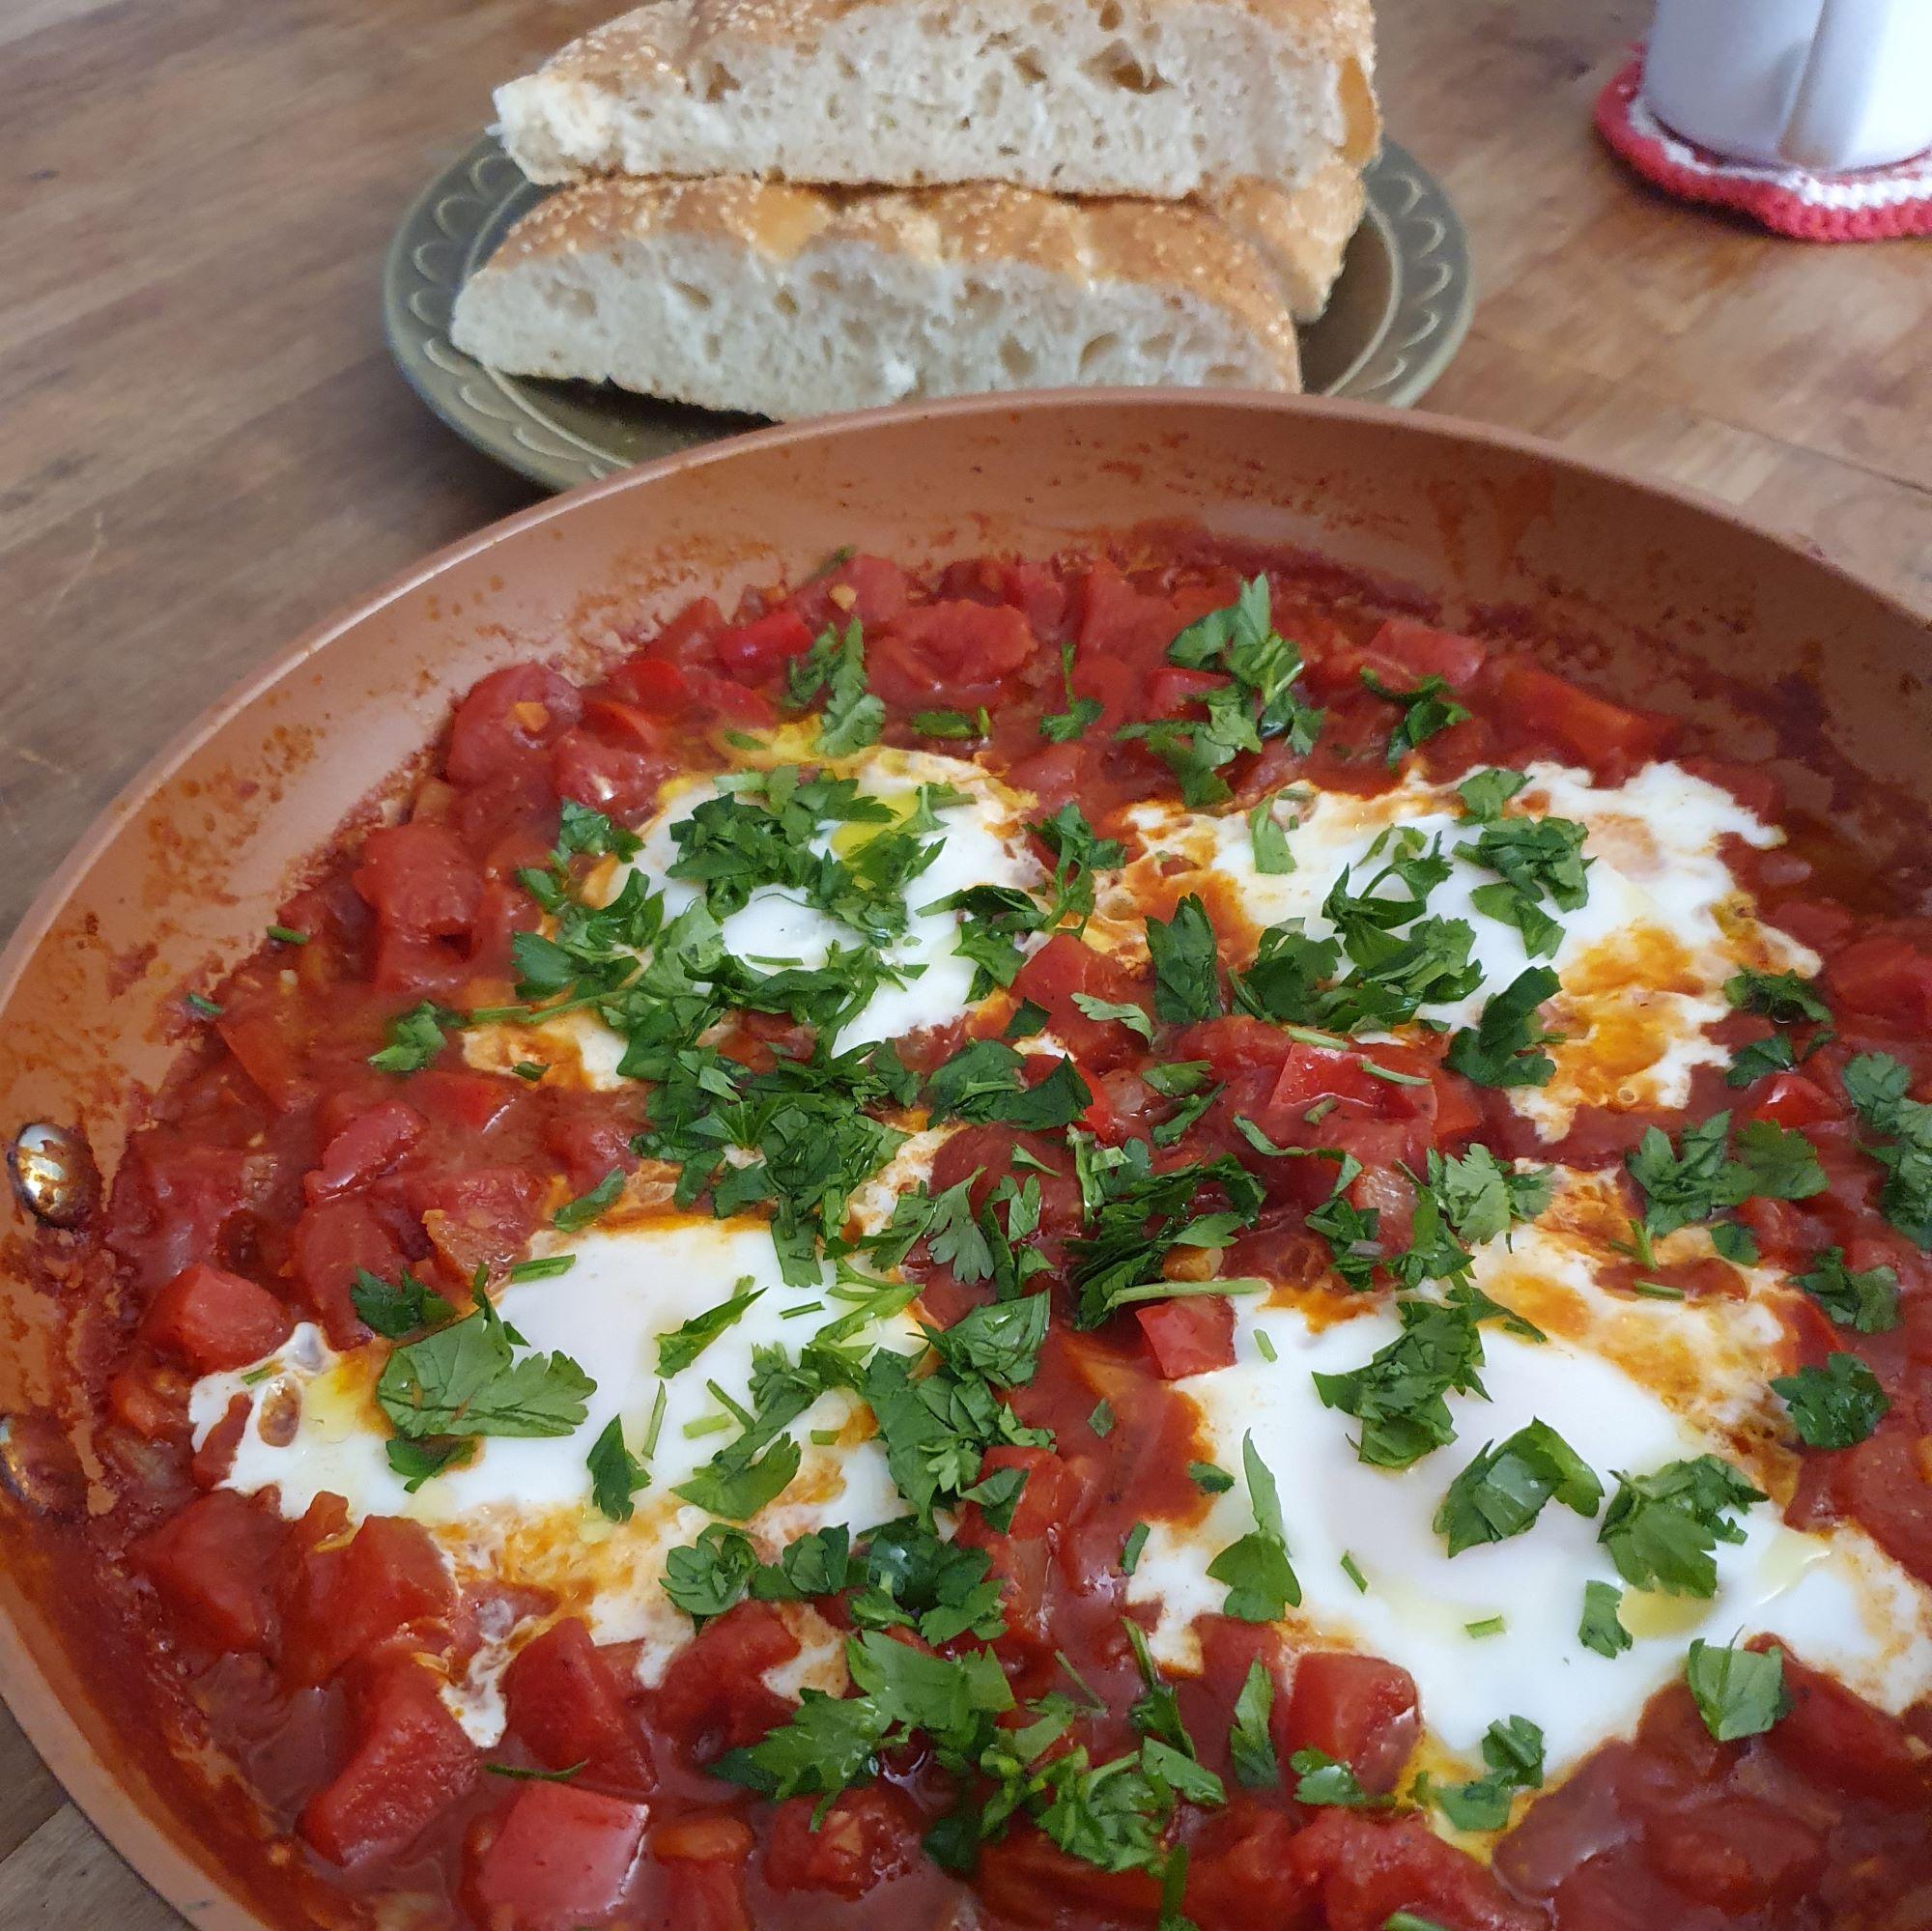 Shashuka vegetarian middle eastern tomatoe poached egggs